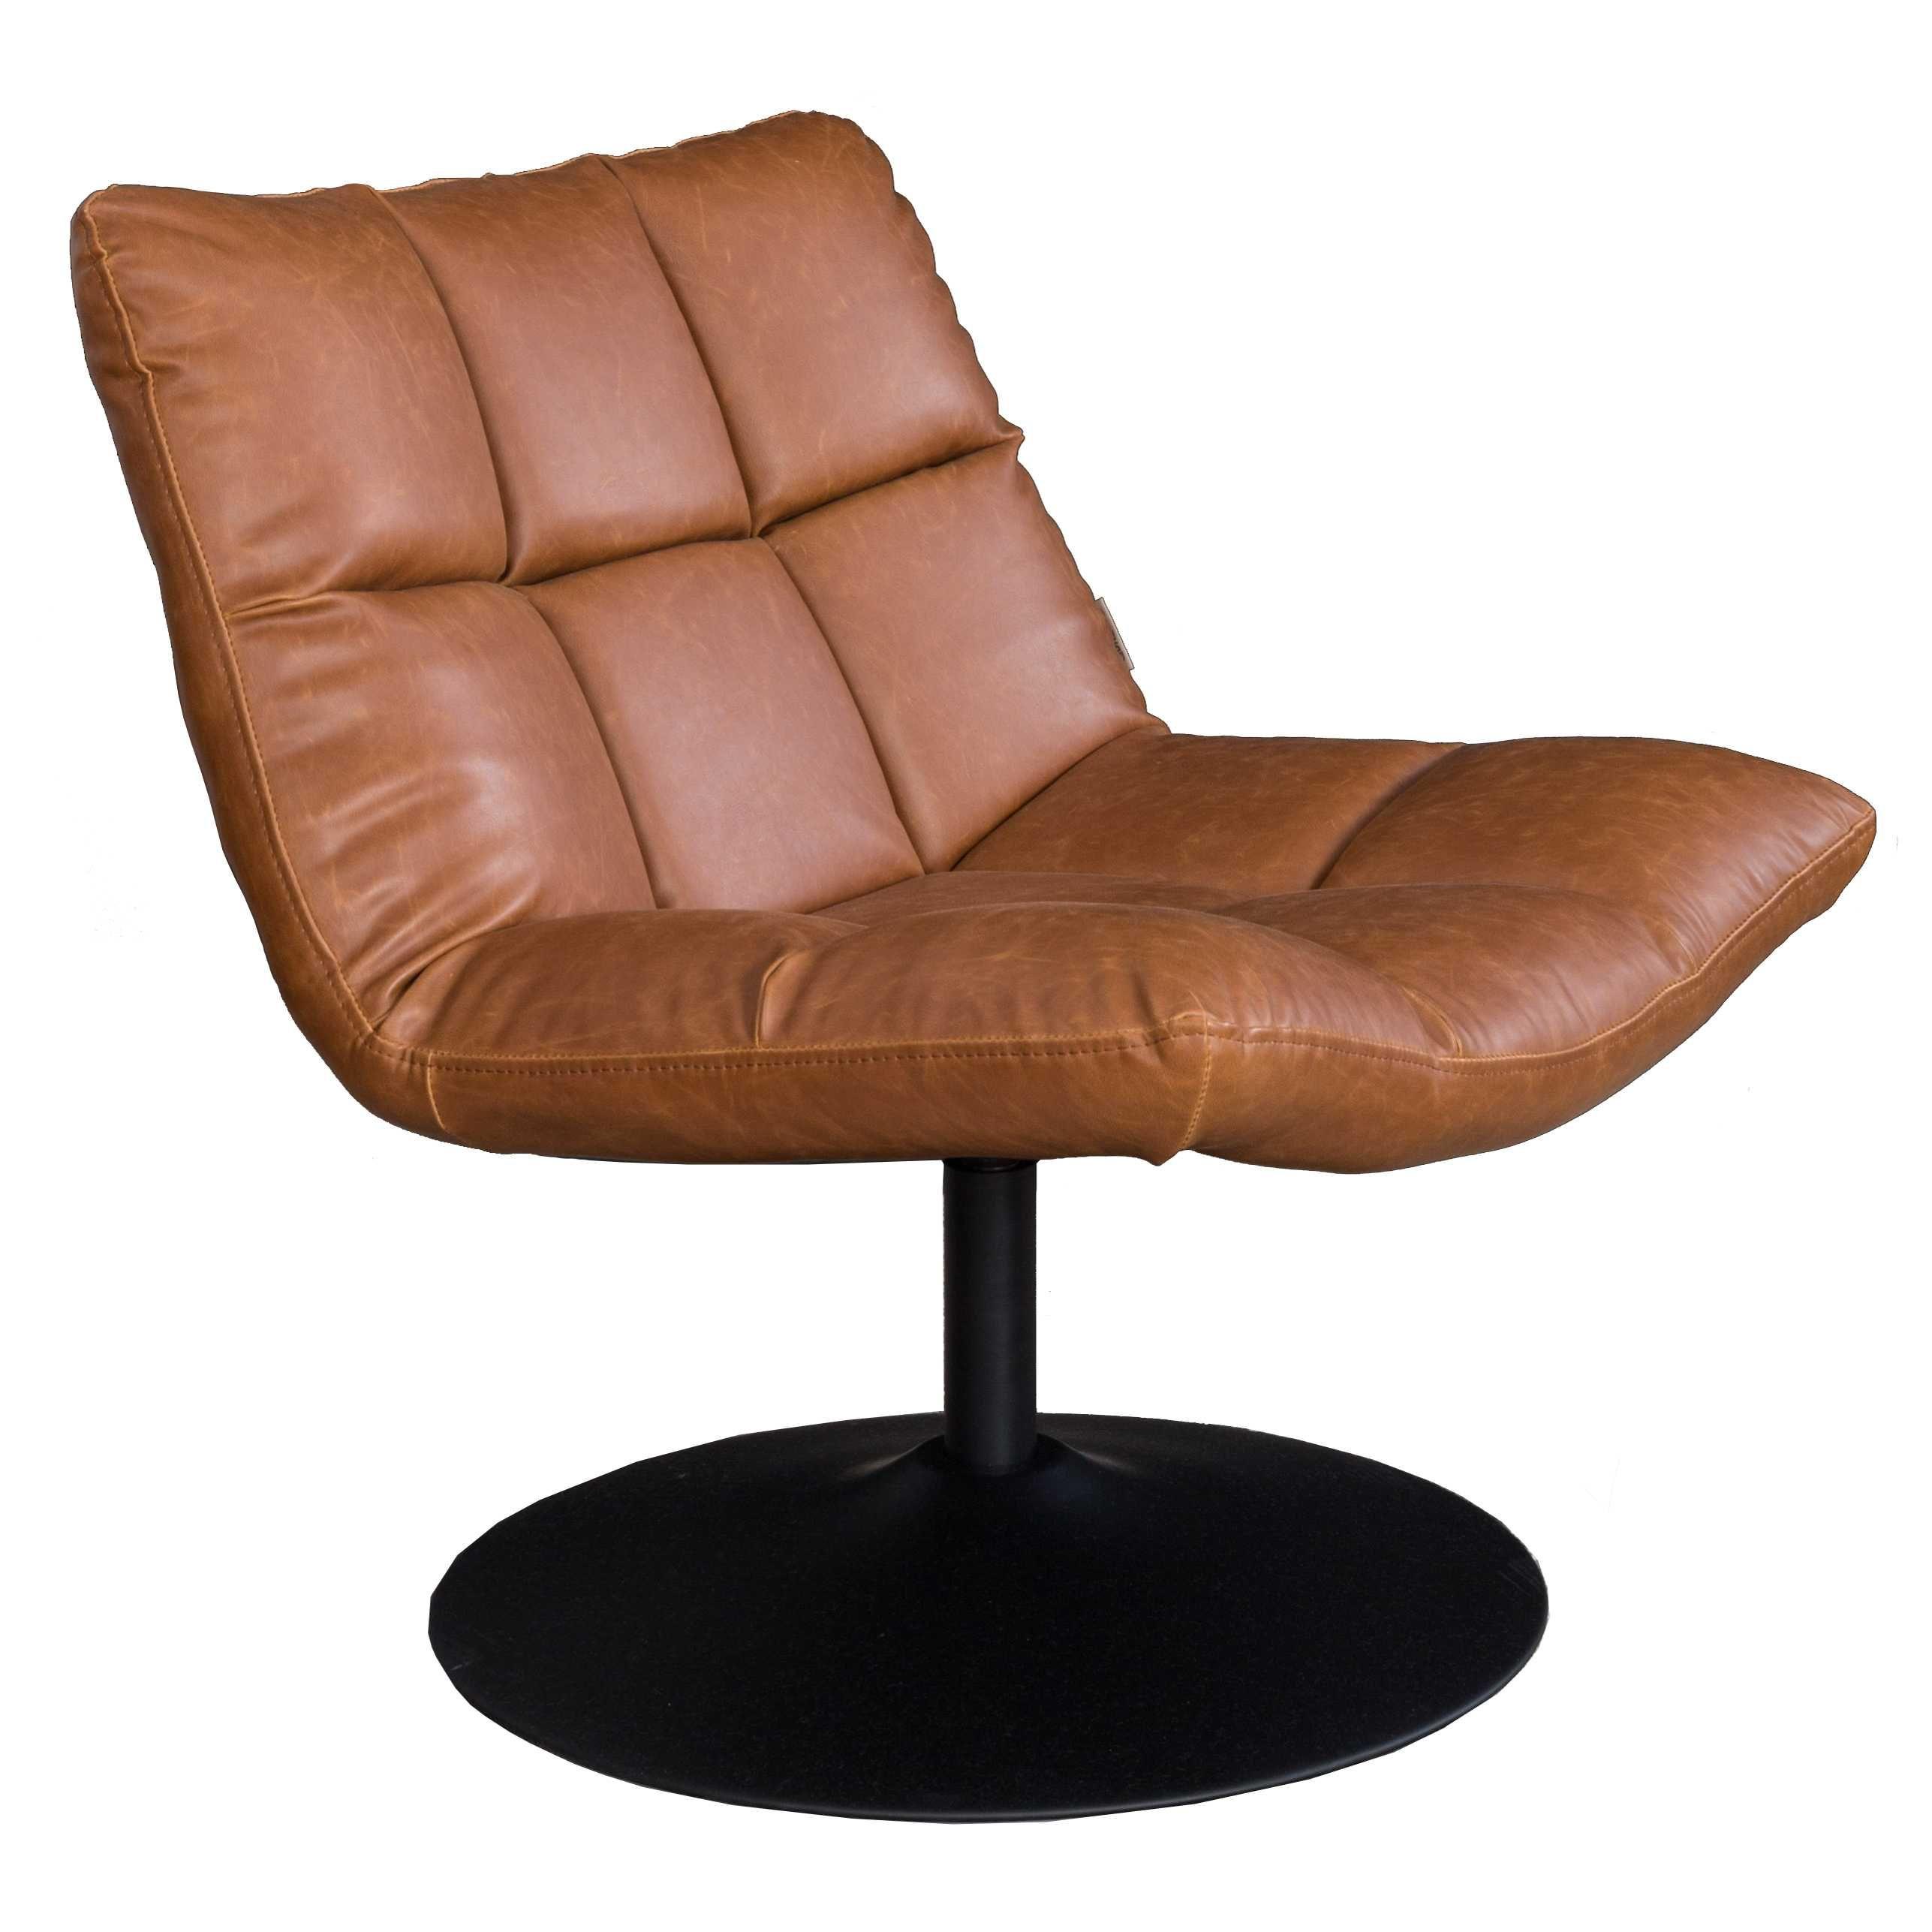 Dutchbone Bar fauteuil vintage bruin kopen